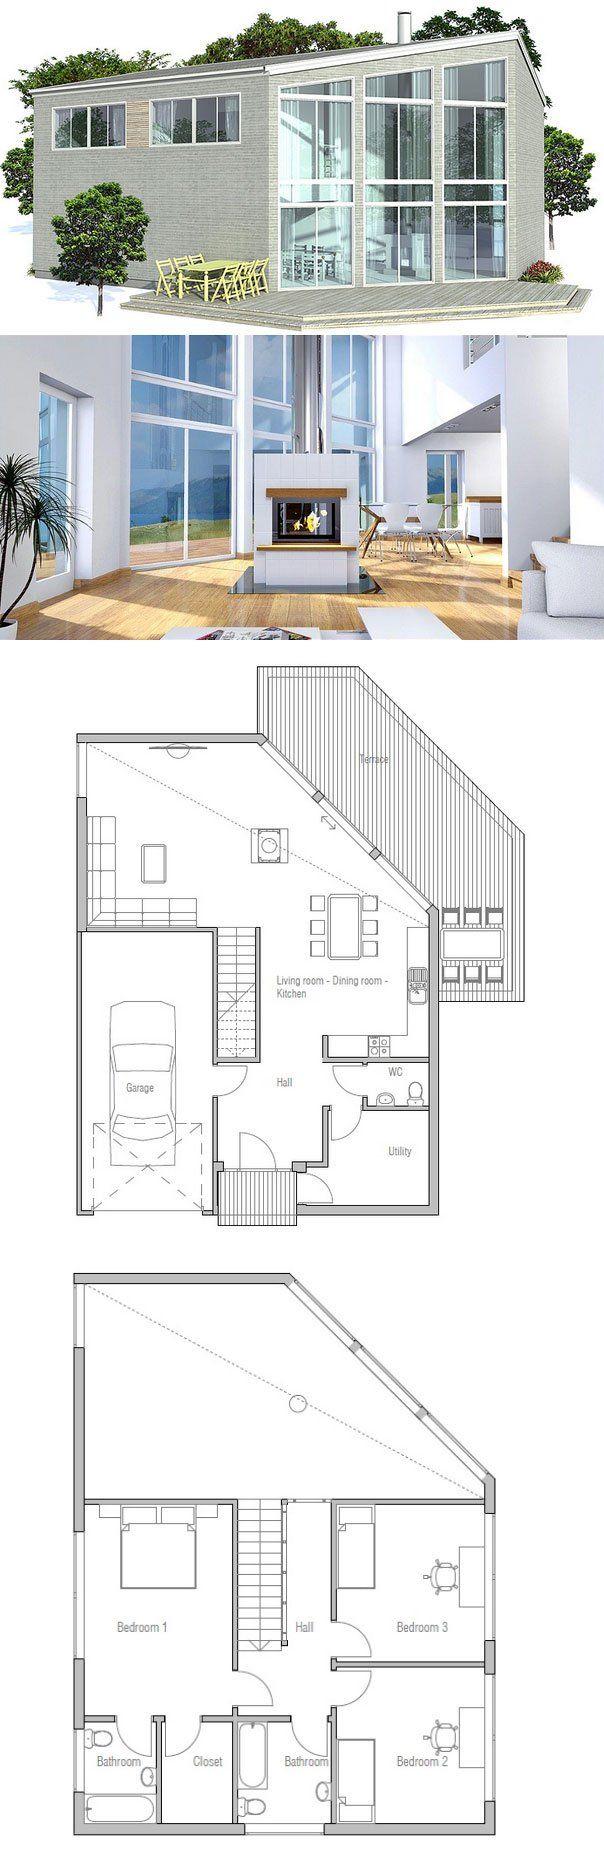 69 Best Narrow House Plans Images On Pinterest Narrow